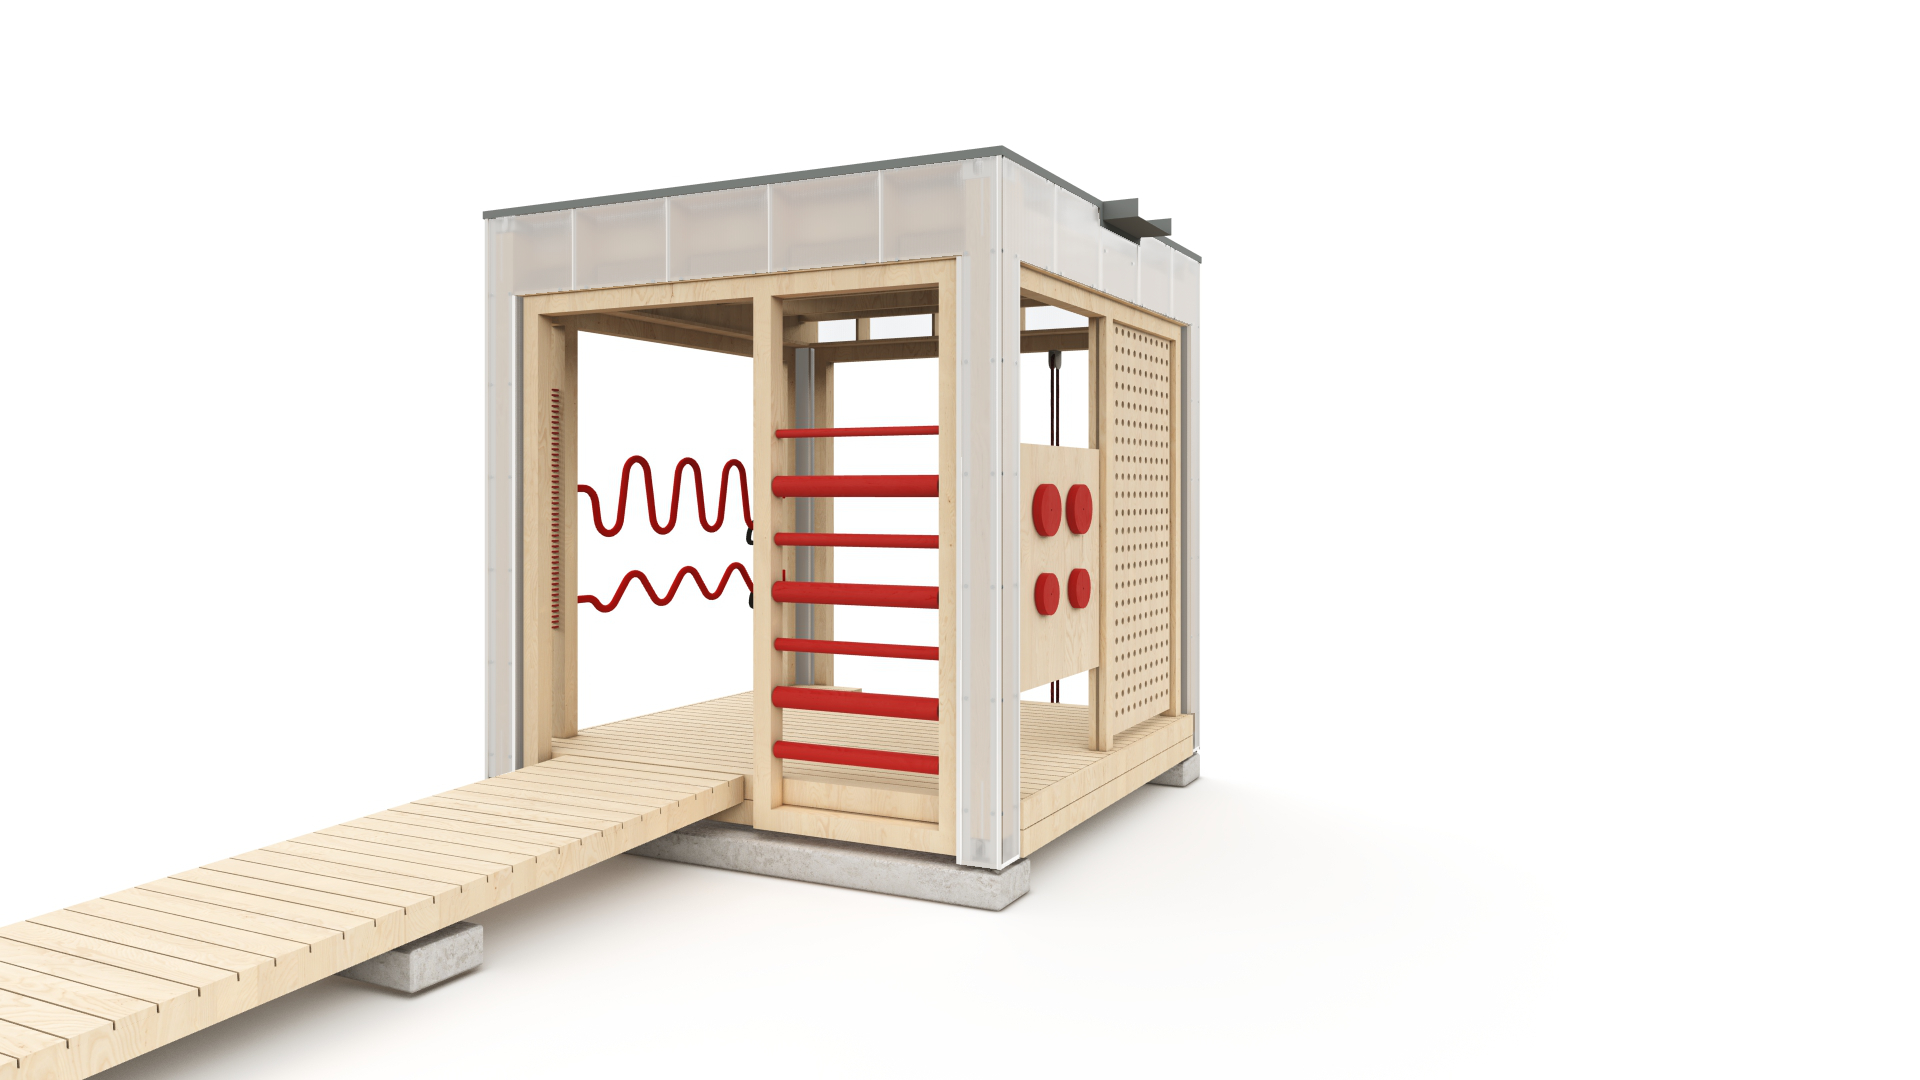 Saue cuboid fpr Baltsenior2.0 project